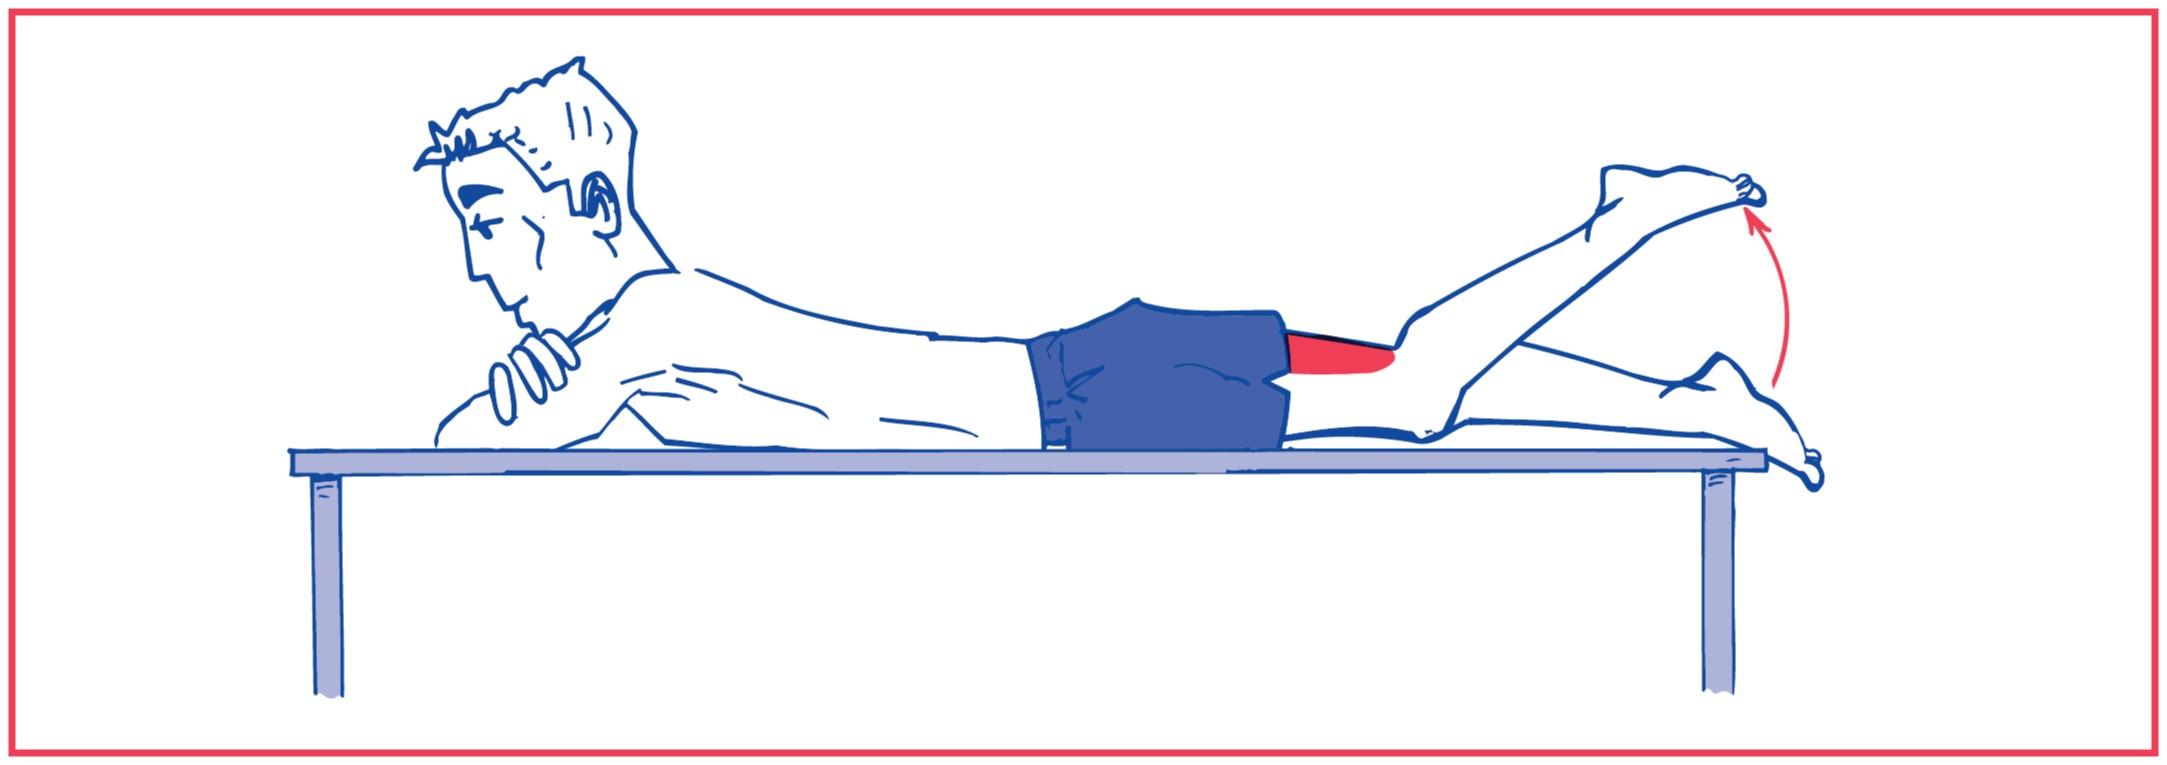 2. Knee flexion against gravity